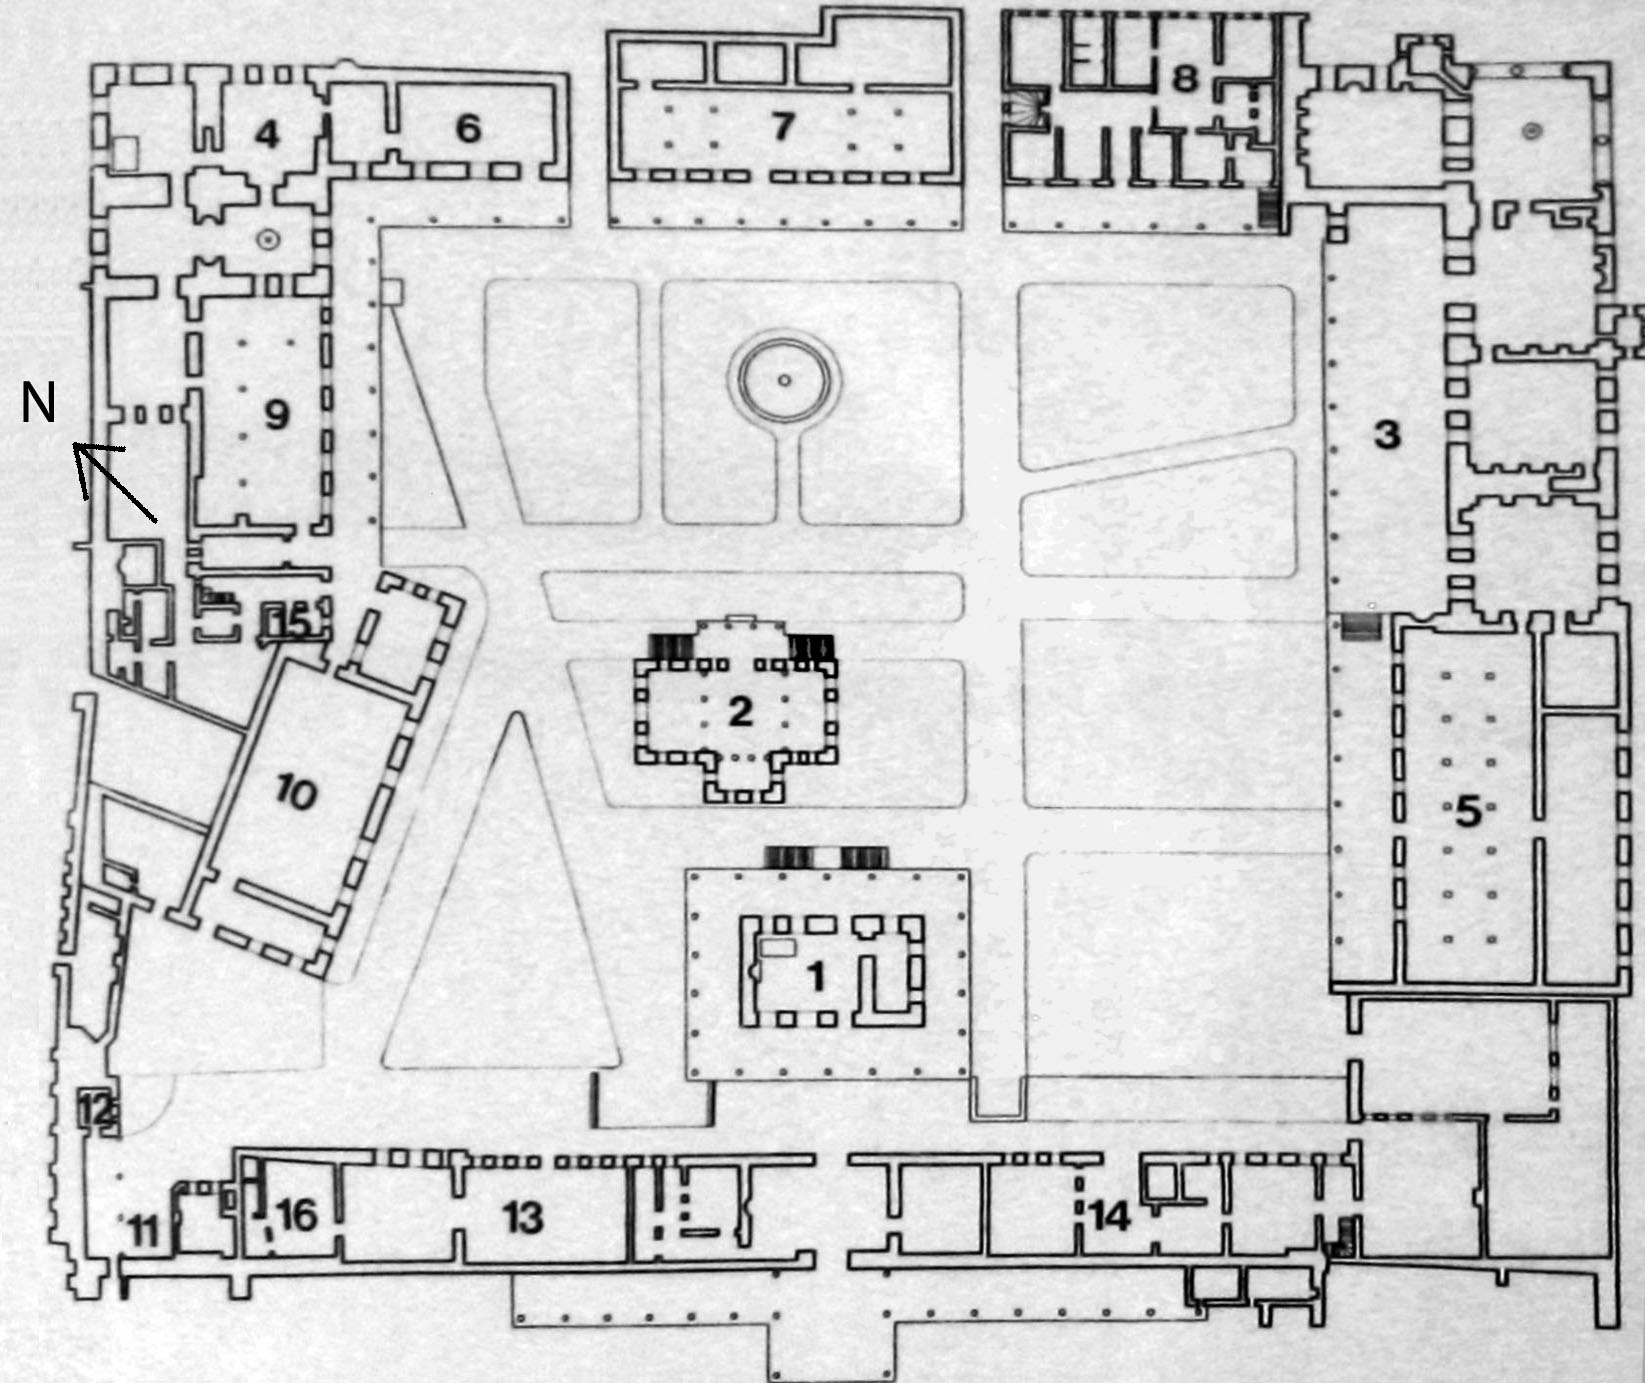 2 Bedroom Floor Plan File Plan Third Court Topkapi Palace Jpg Wikimedia Commons